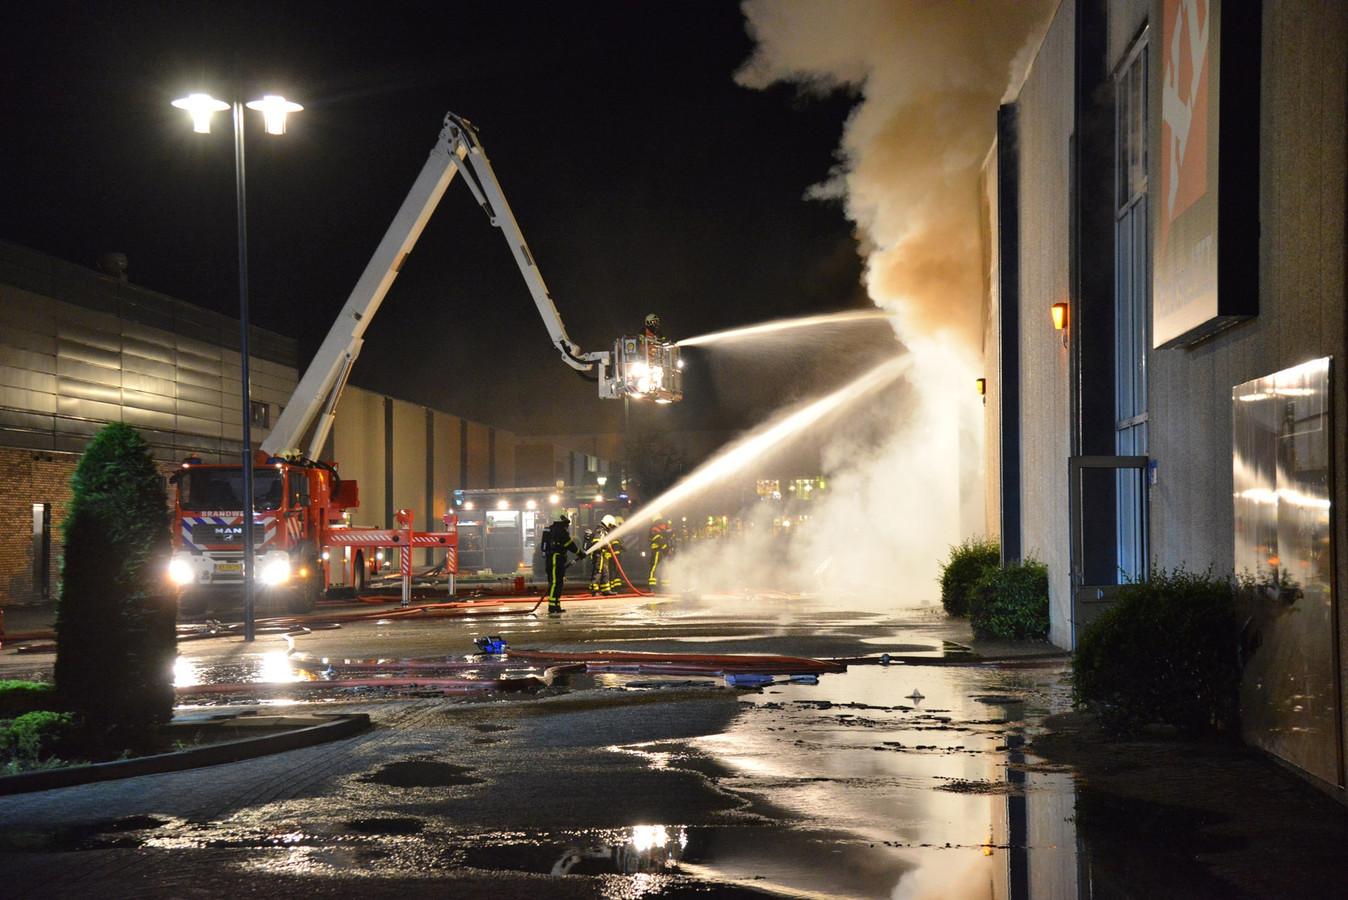 Grote brand woonboulevard breda xxl: sein brand meester gegeven